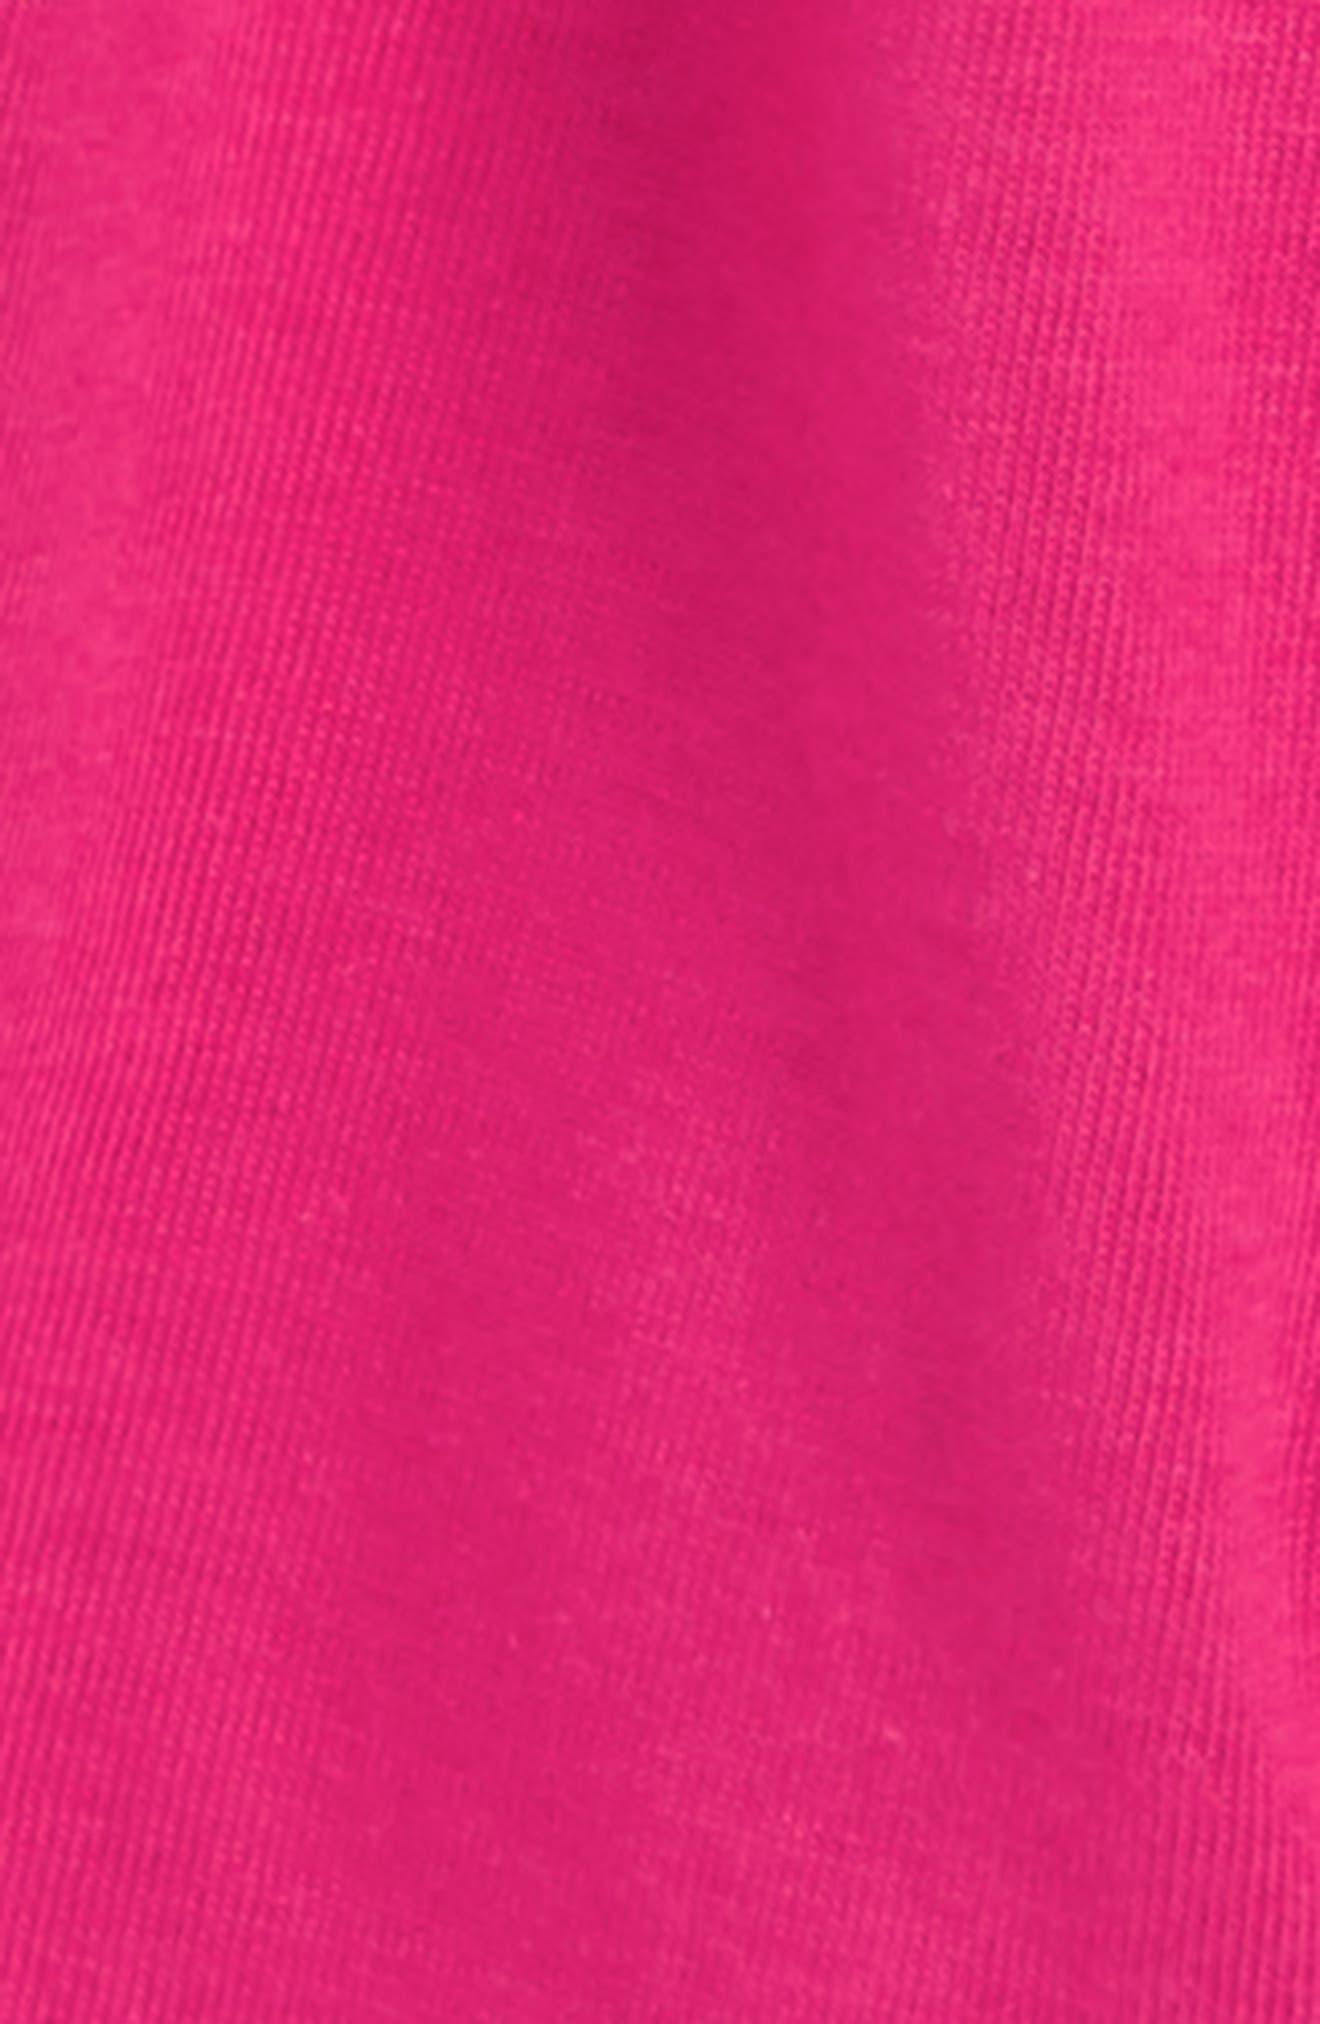 PUMA, Surplice Back Jersey Romper, Alternate thumbnail 3, color, FUCHSIA PURPLE